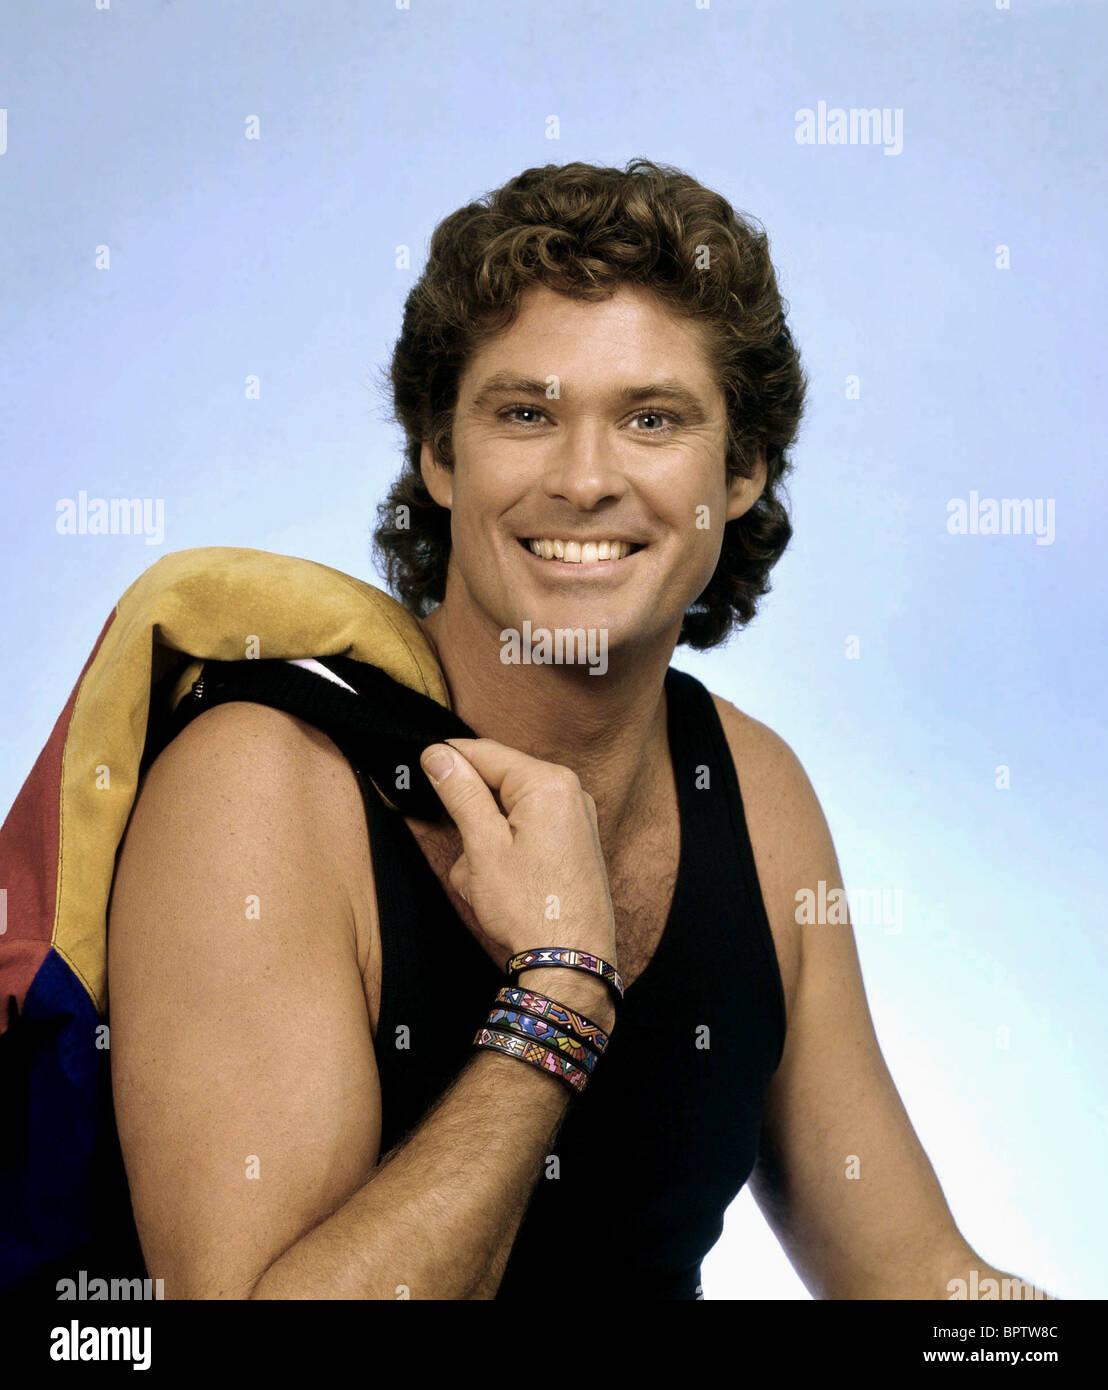 DAVID HASSELHOFF actor y cantante (1989) Imagen De Stock